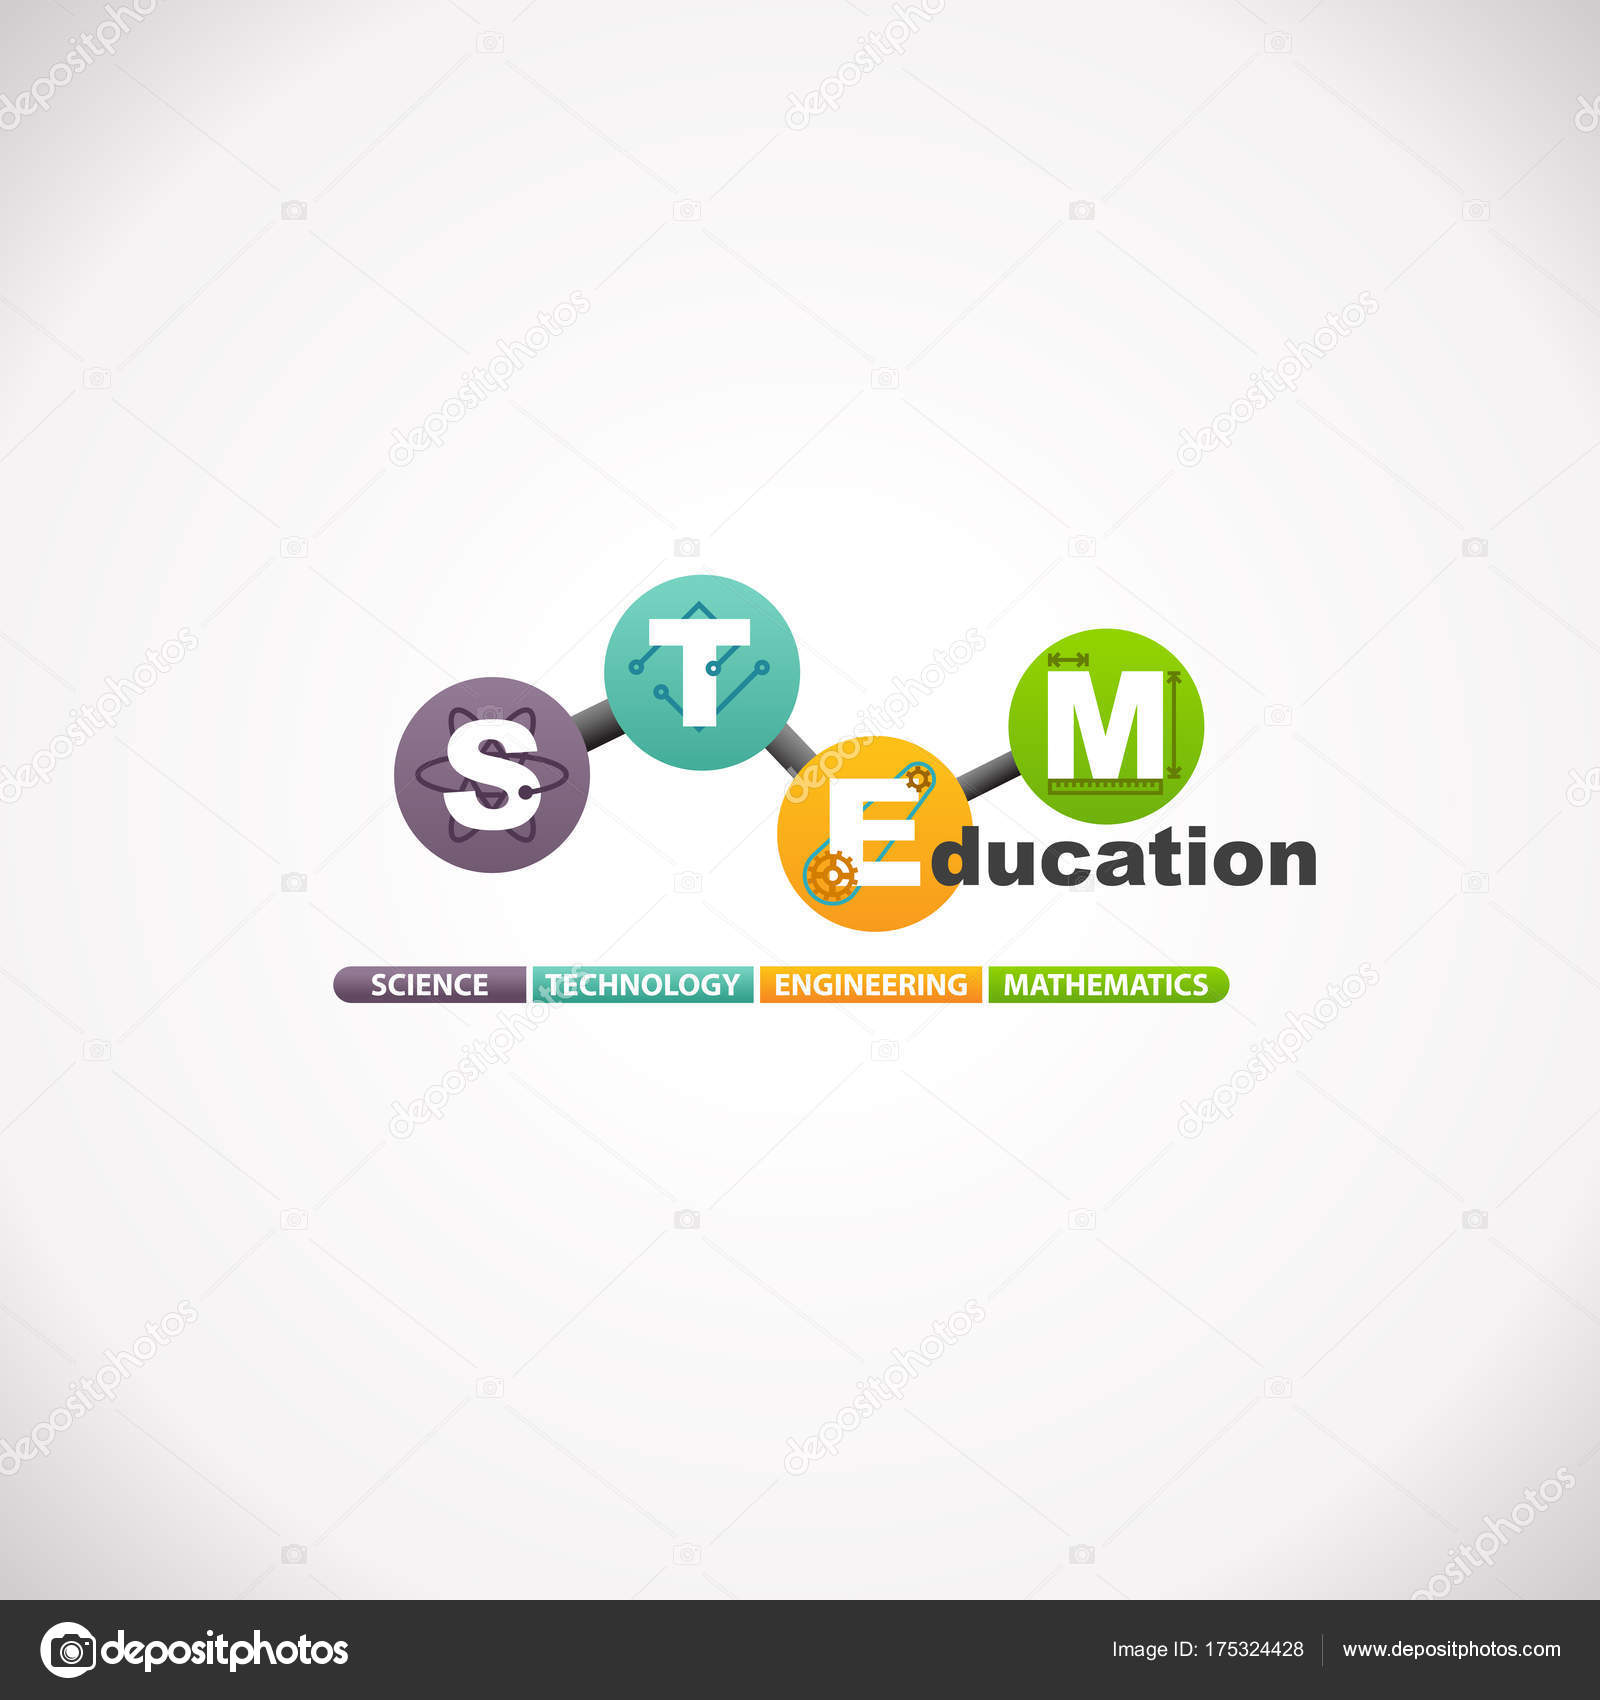 Stem Education Concept Logo Science Technology Engineering Mathematics Stock Vector C Arrow123 175324428